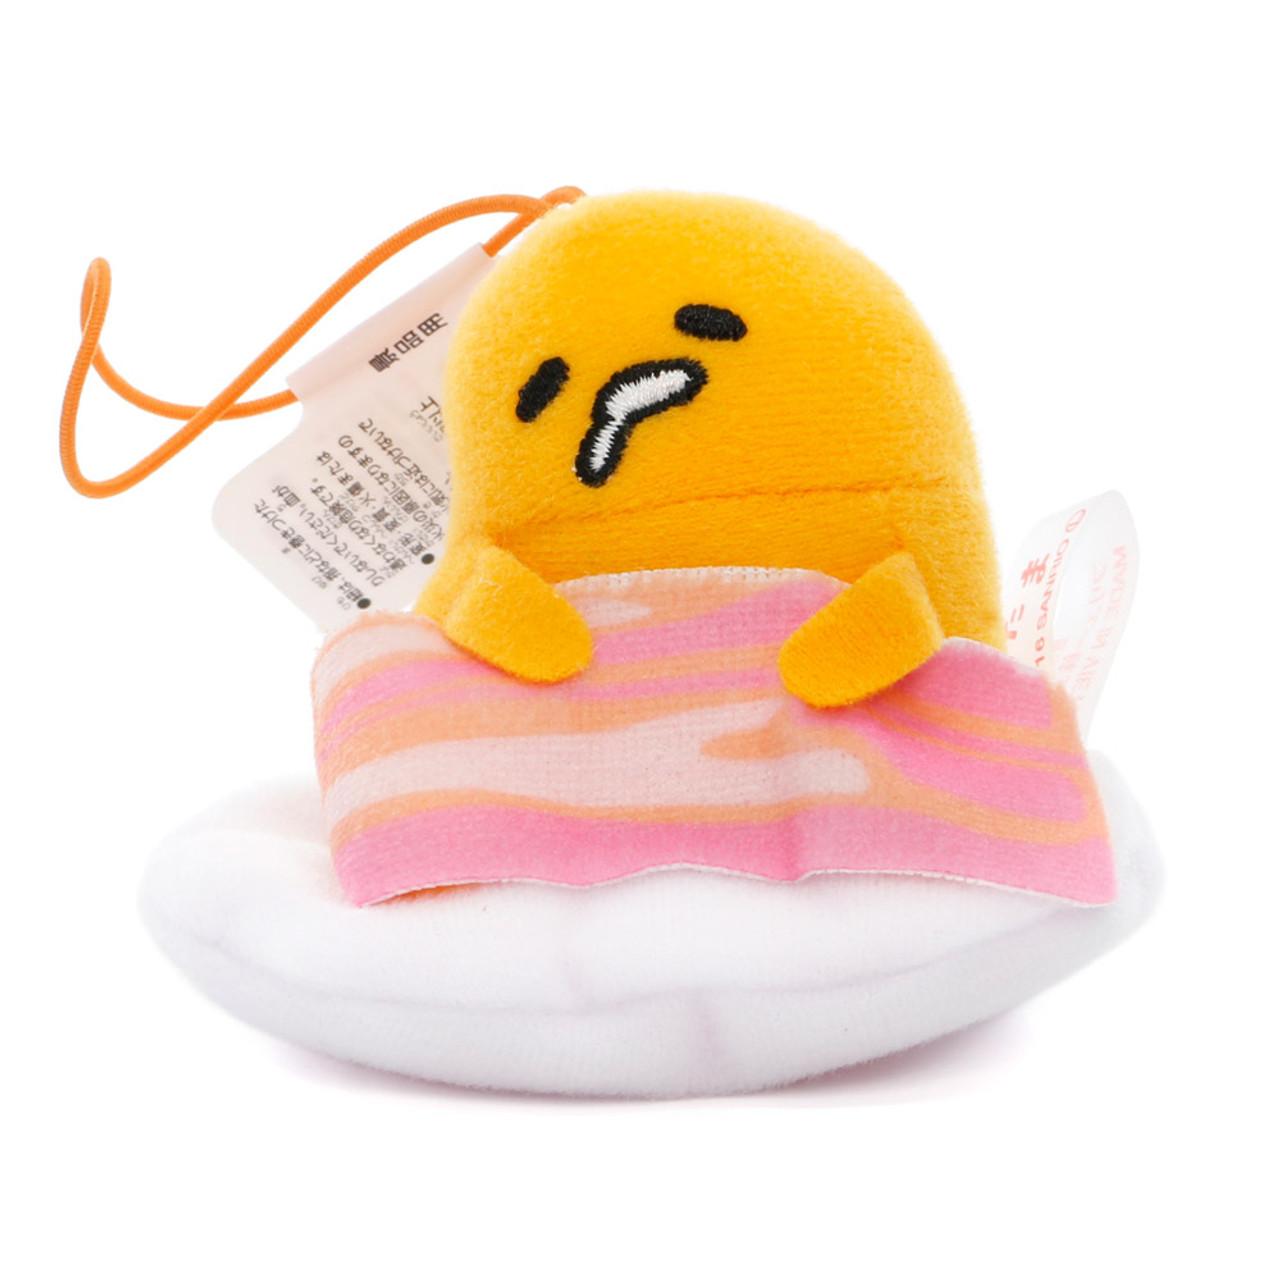 Sanrio Gudetama Lazy Egg Sleeping Mascot Plush Charms - Bacon ( Front View )